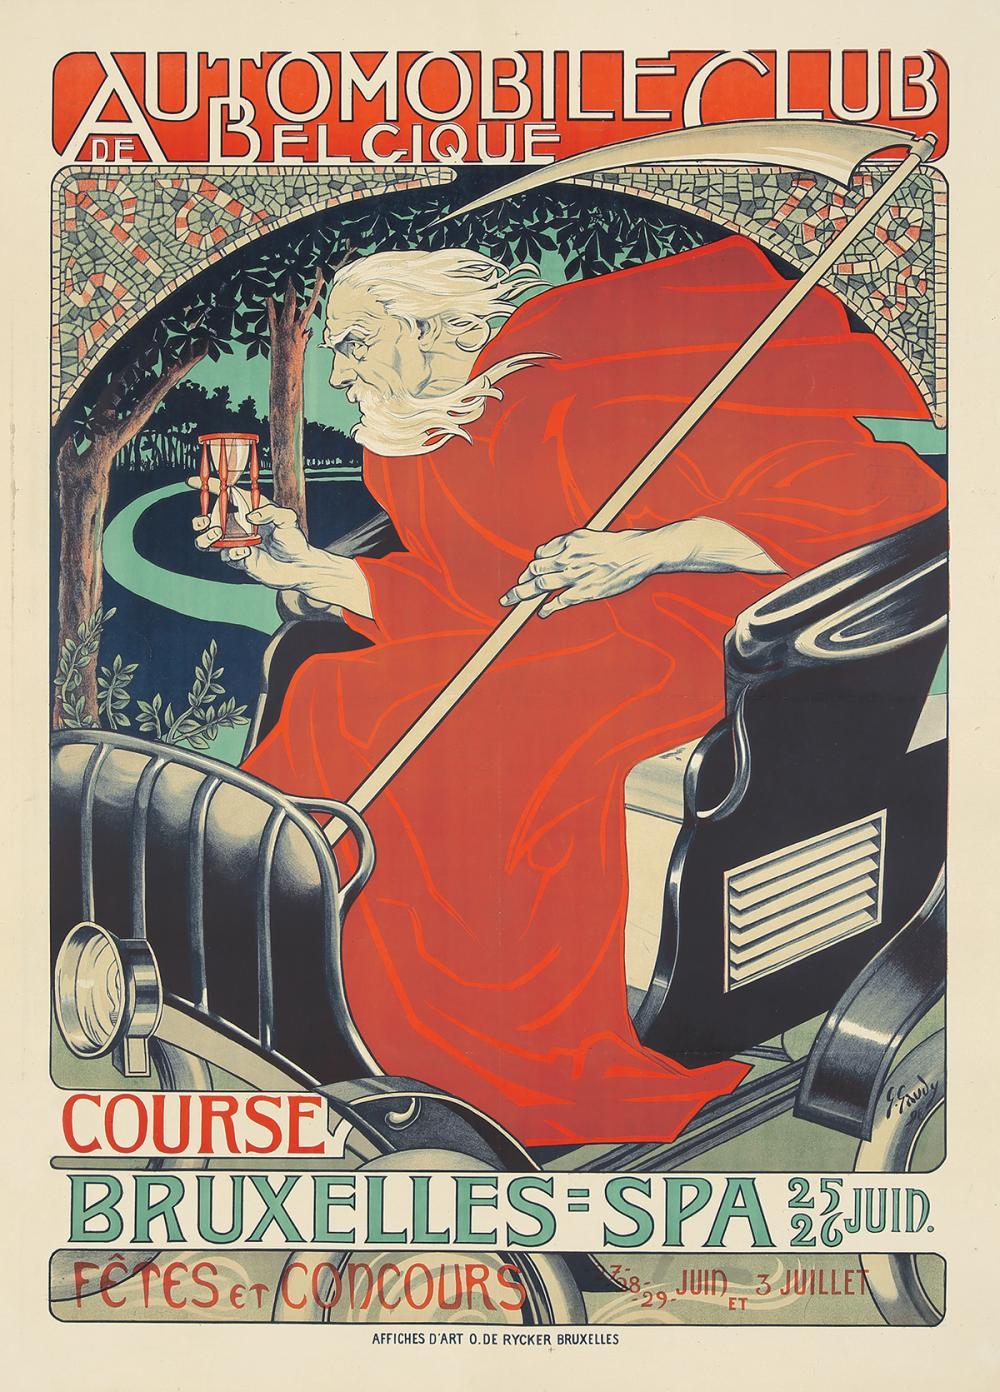 Automobile Club de Belgique. 1898.